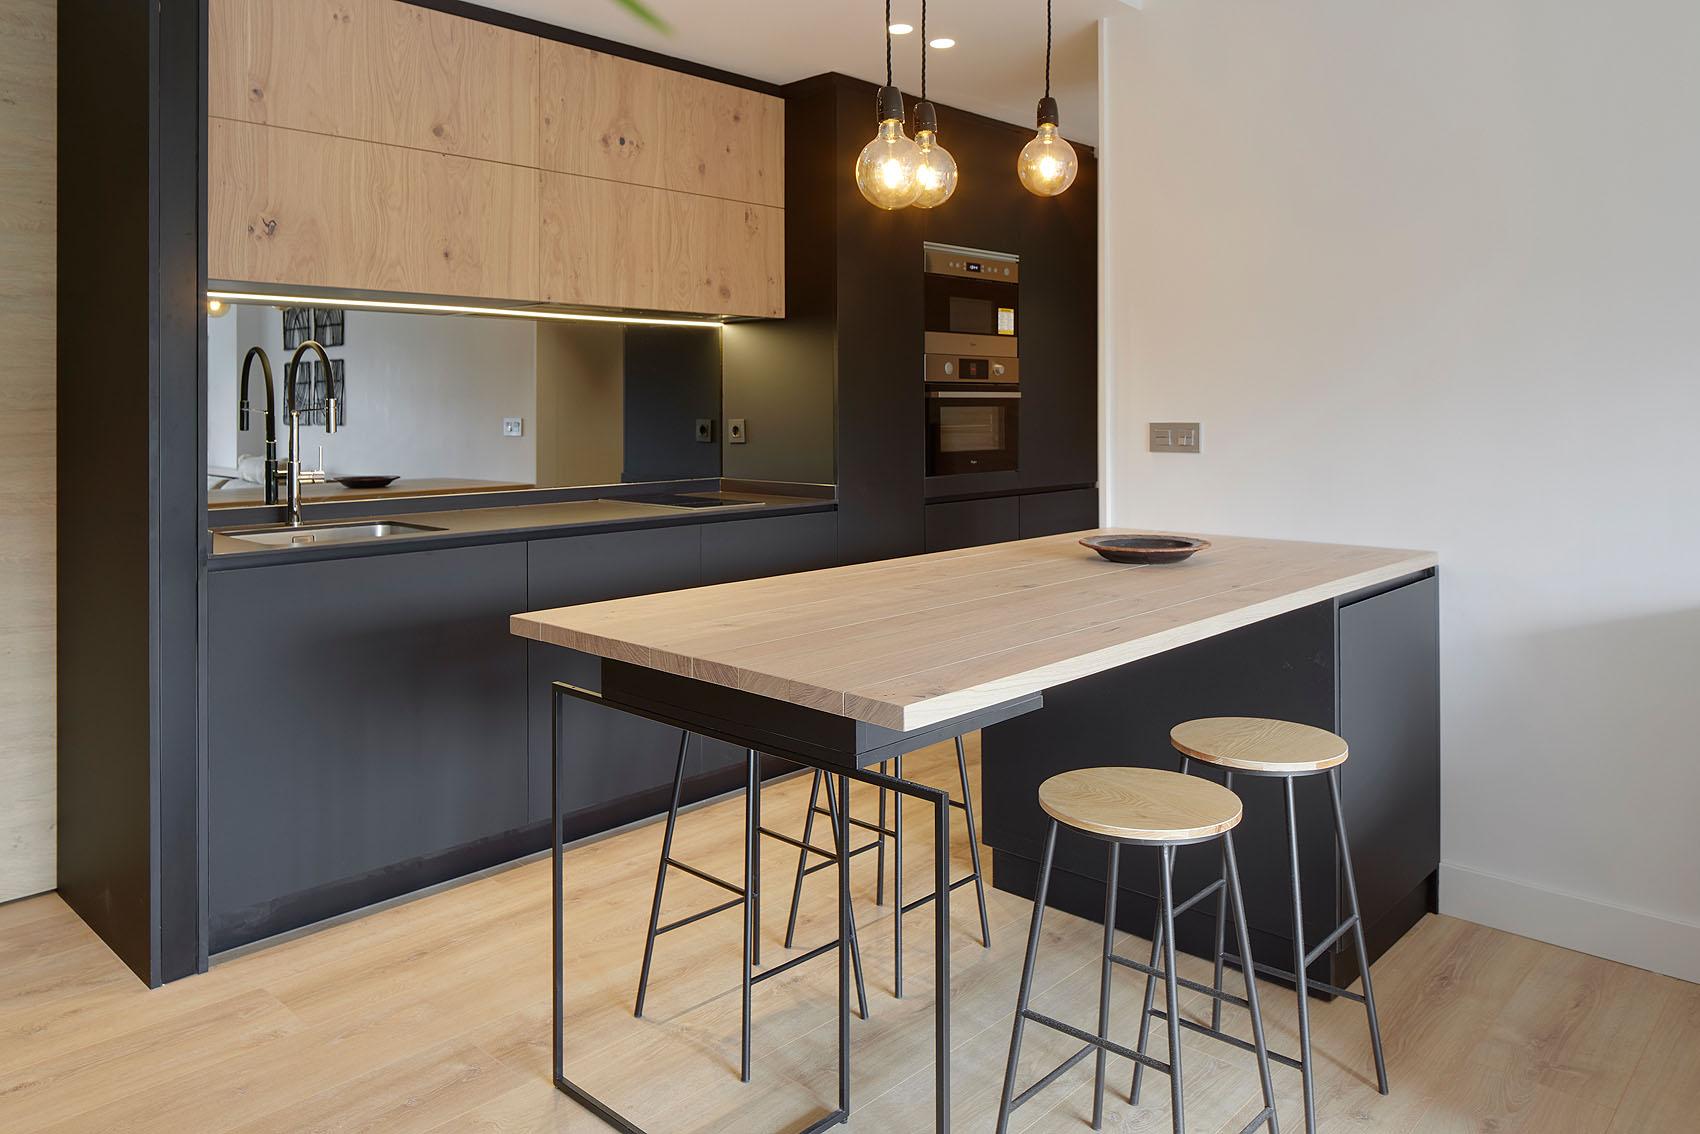 Apartamento turístico en Donostia - Iñaki Caperochipi - Fotografía